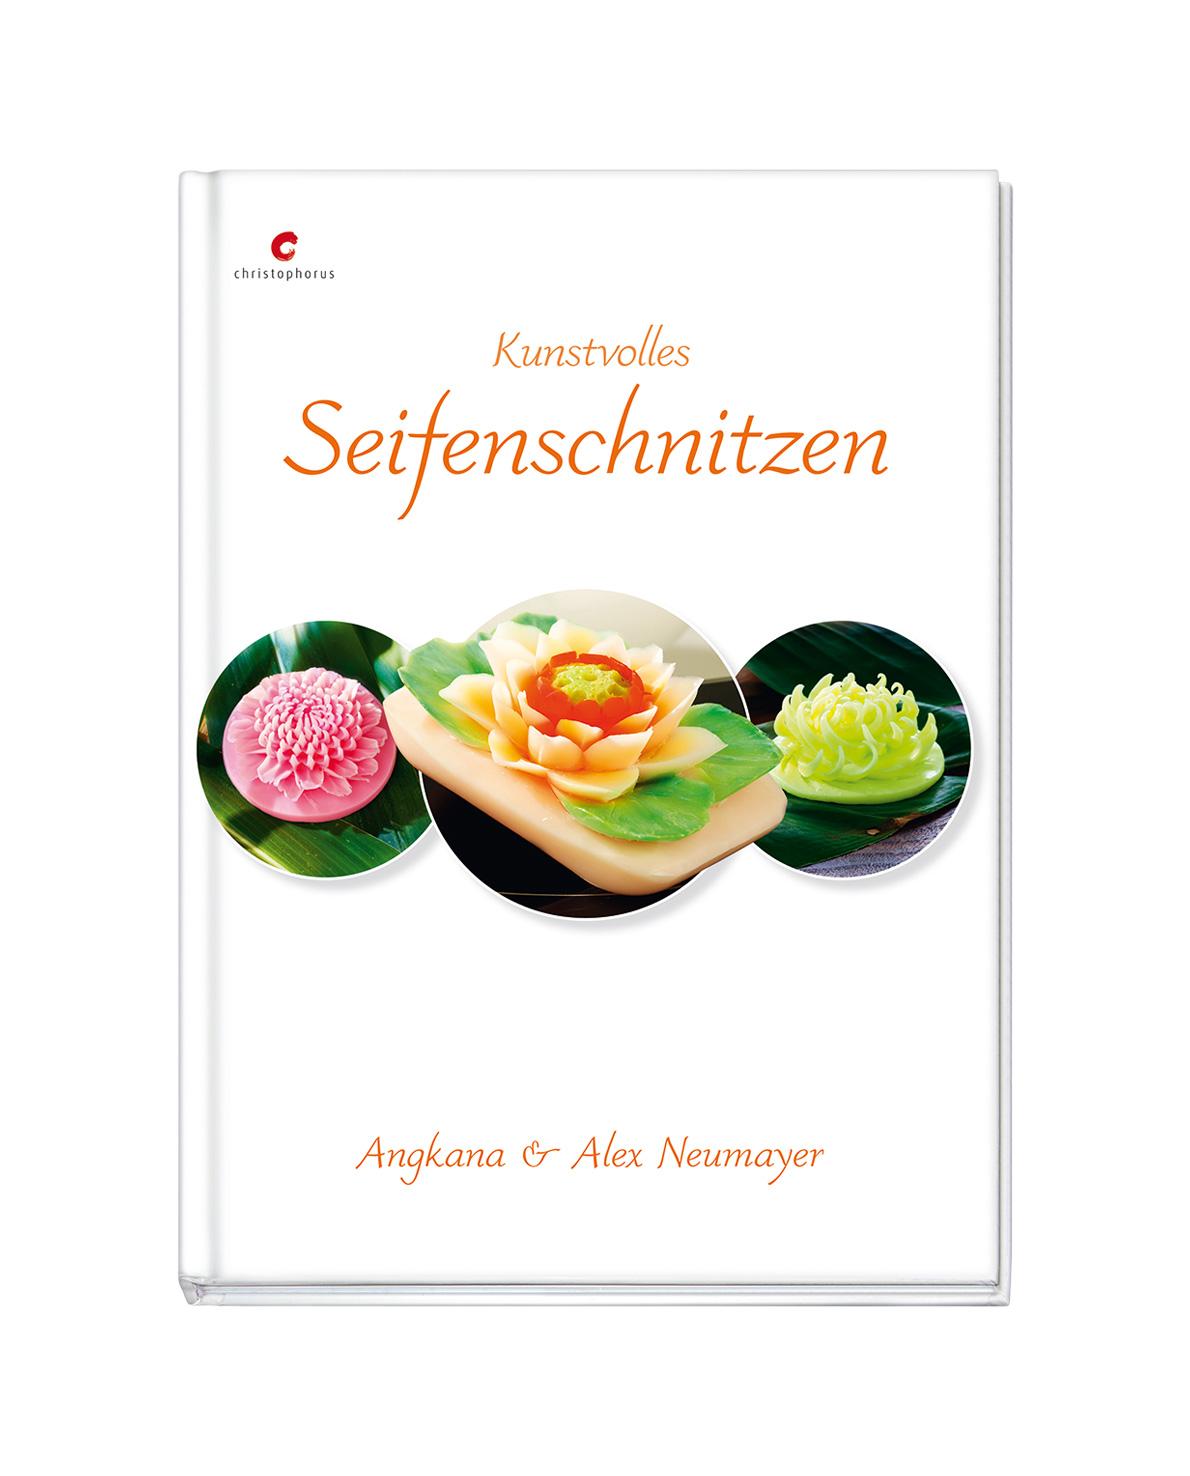 Buch Anleitung Kunstvolles Seifenschnitzen von Alex & Angkana Neumayer Carving